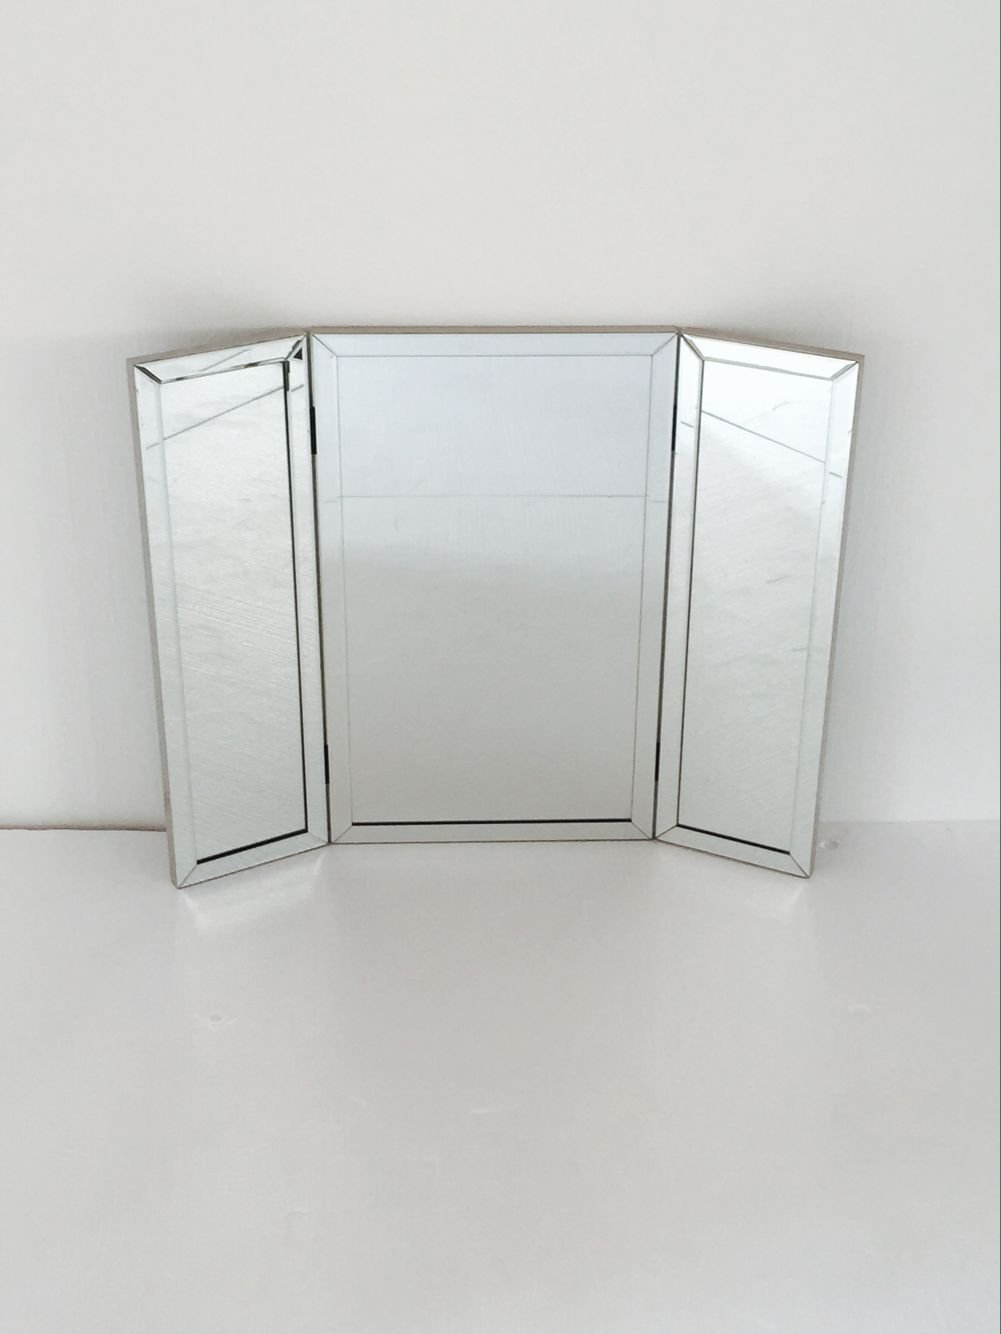 Tri-Fold Adjustable Desk-Top/Table Vanity Mirror